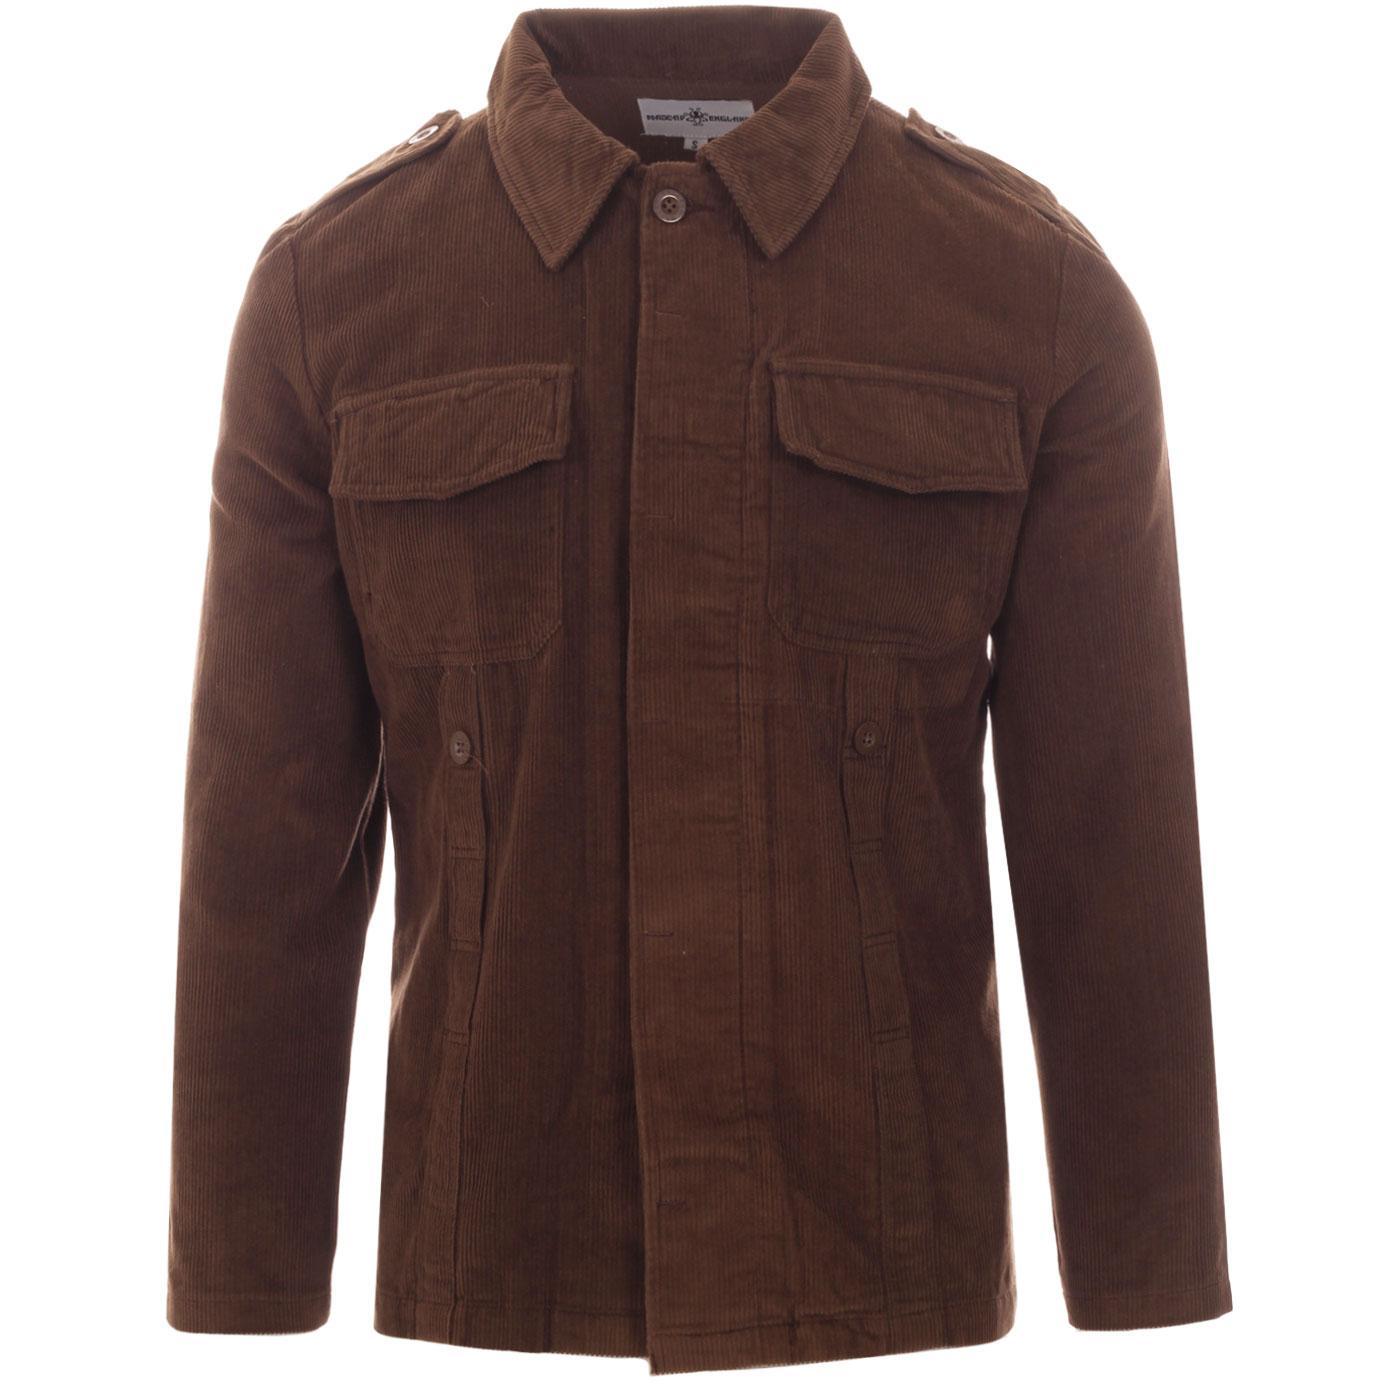 Lennon MADCAP ENGLAND Mod Cord Shirt Jacket COCOA